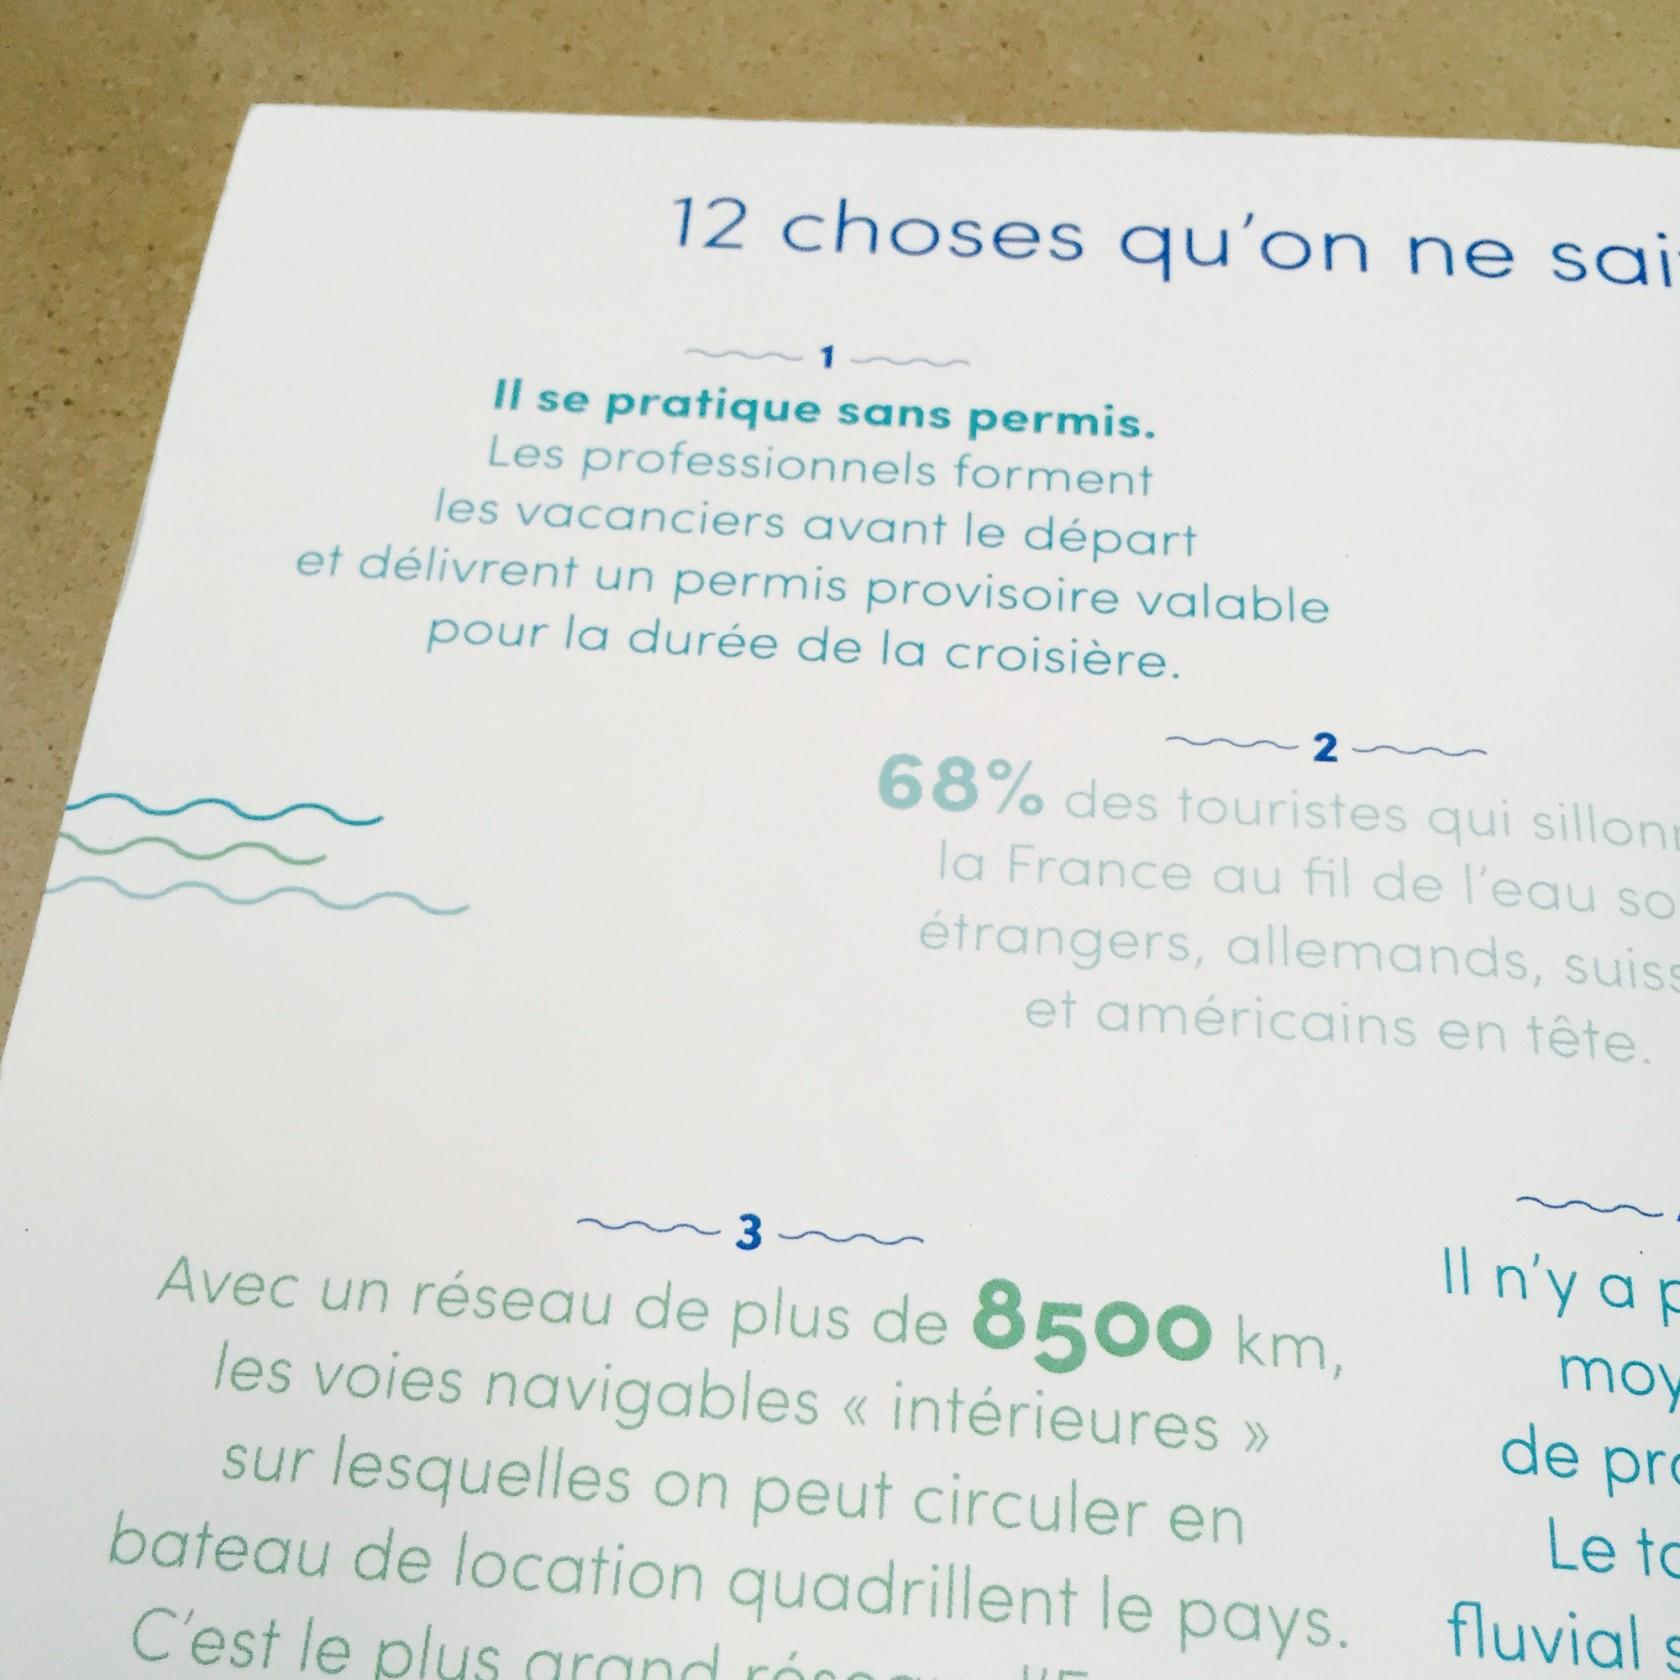 fouinzanardi -  fz_print_rp_com_tourismefluvial_8